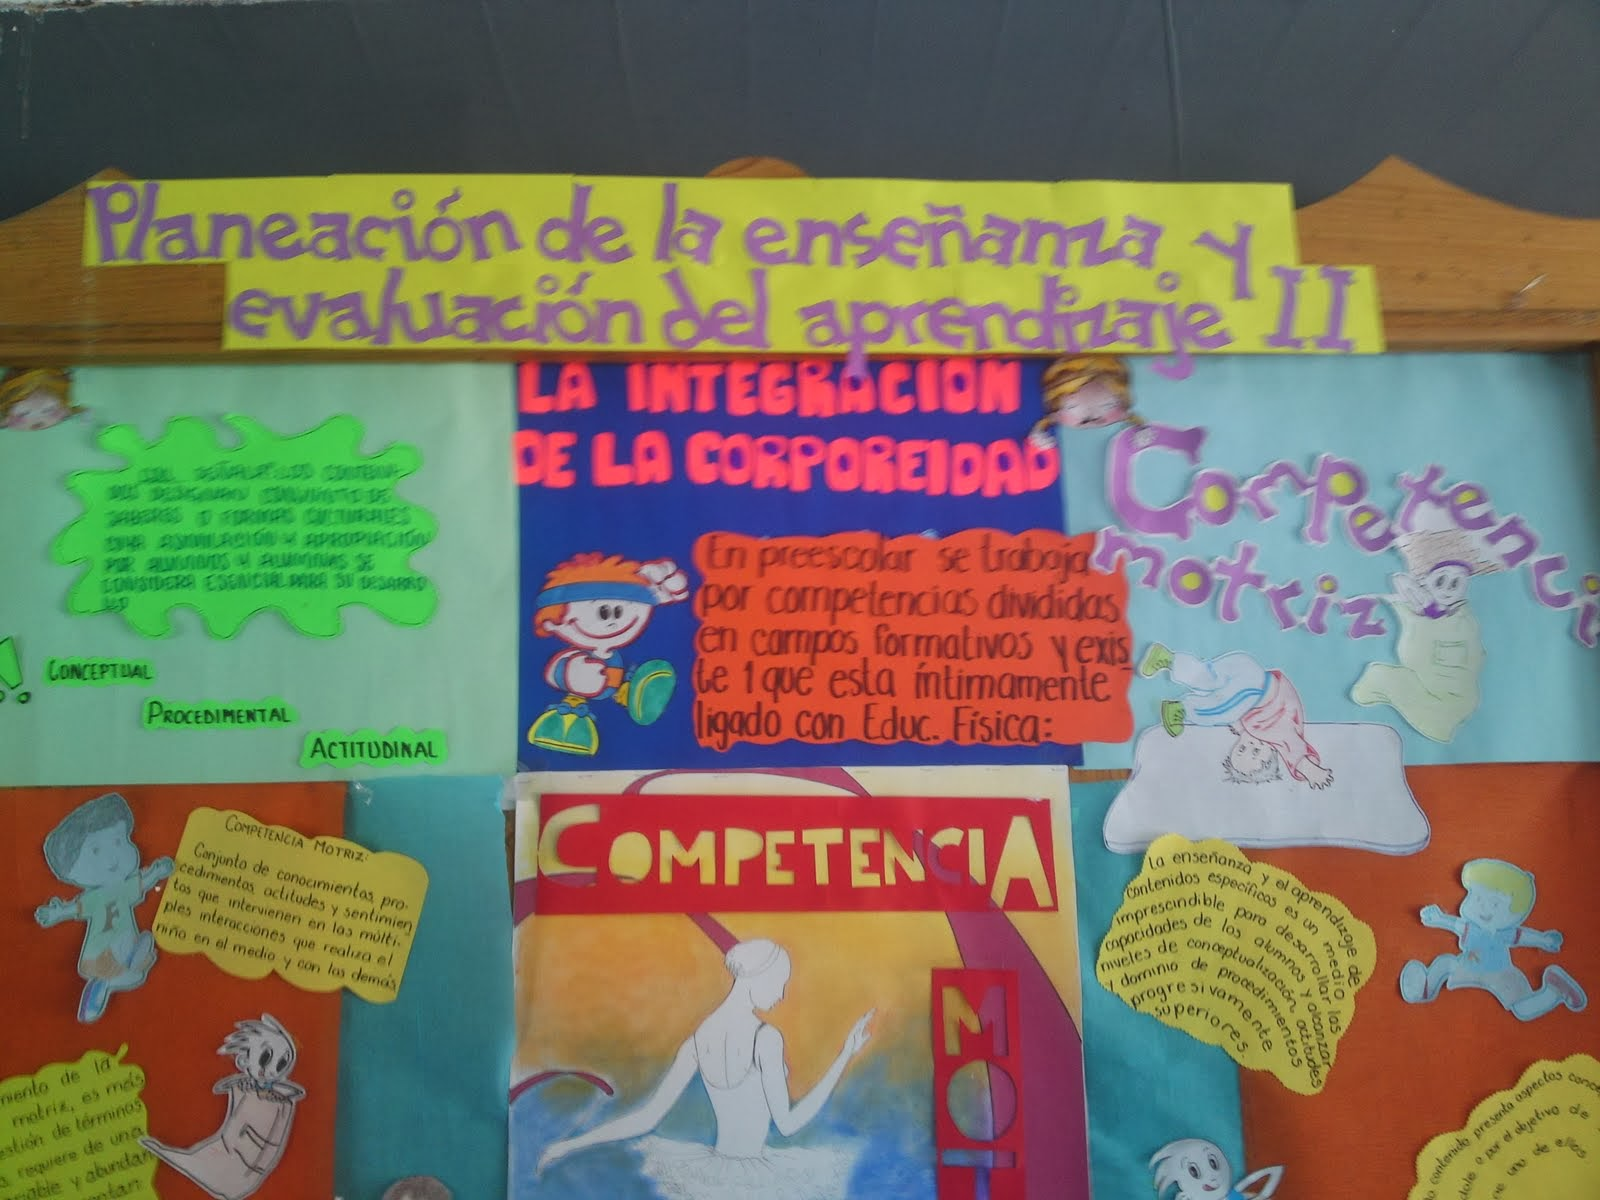 Blog de yuliana b ez p rez periodico mural de psicolog a for Concepto de periodico mural